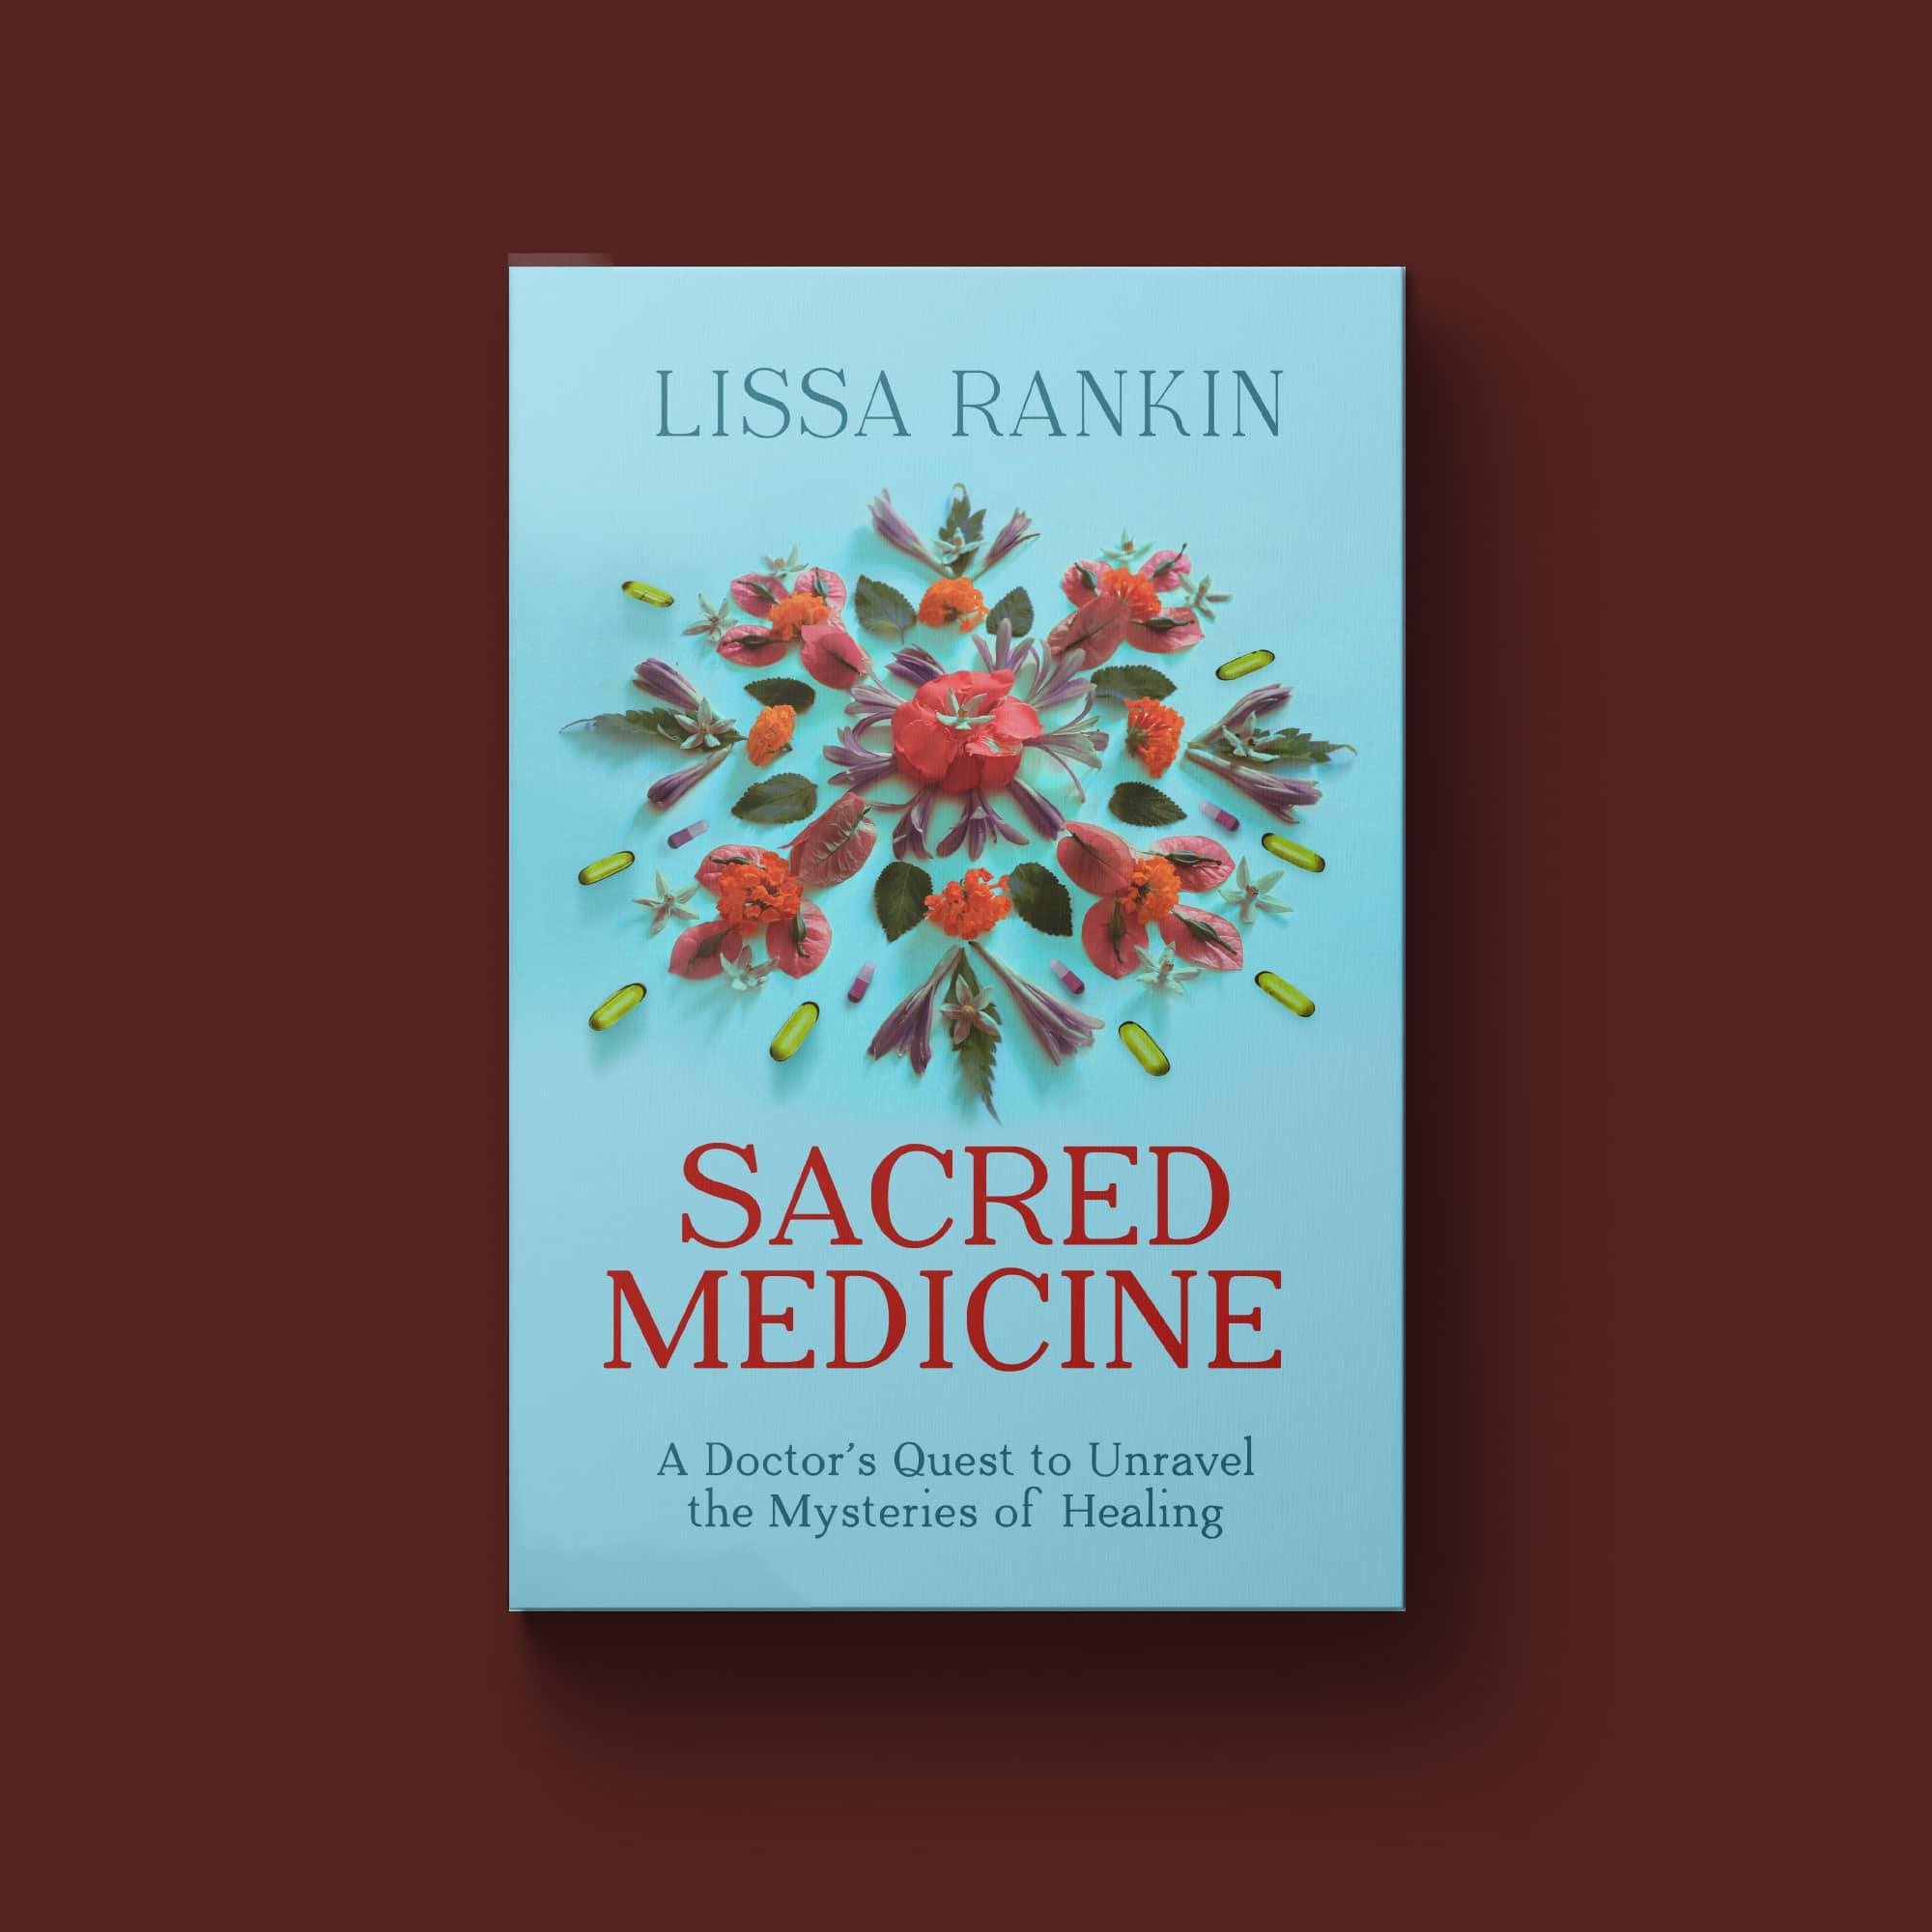 sacred-medicine-cover-concept-3